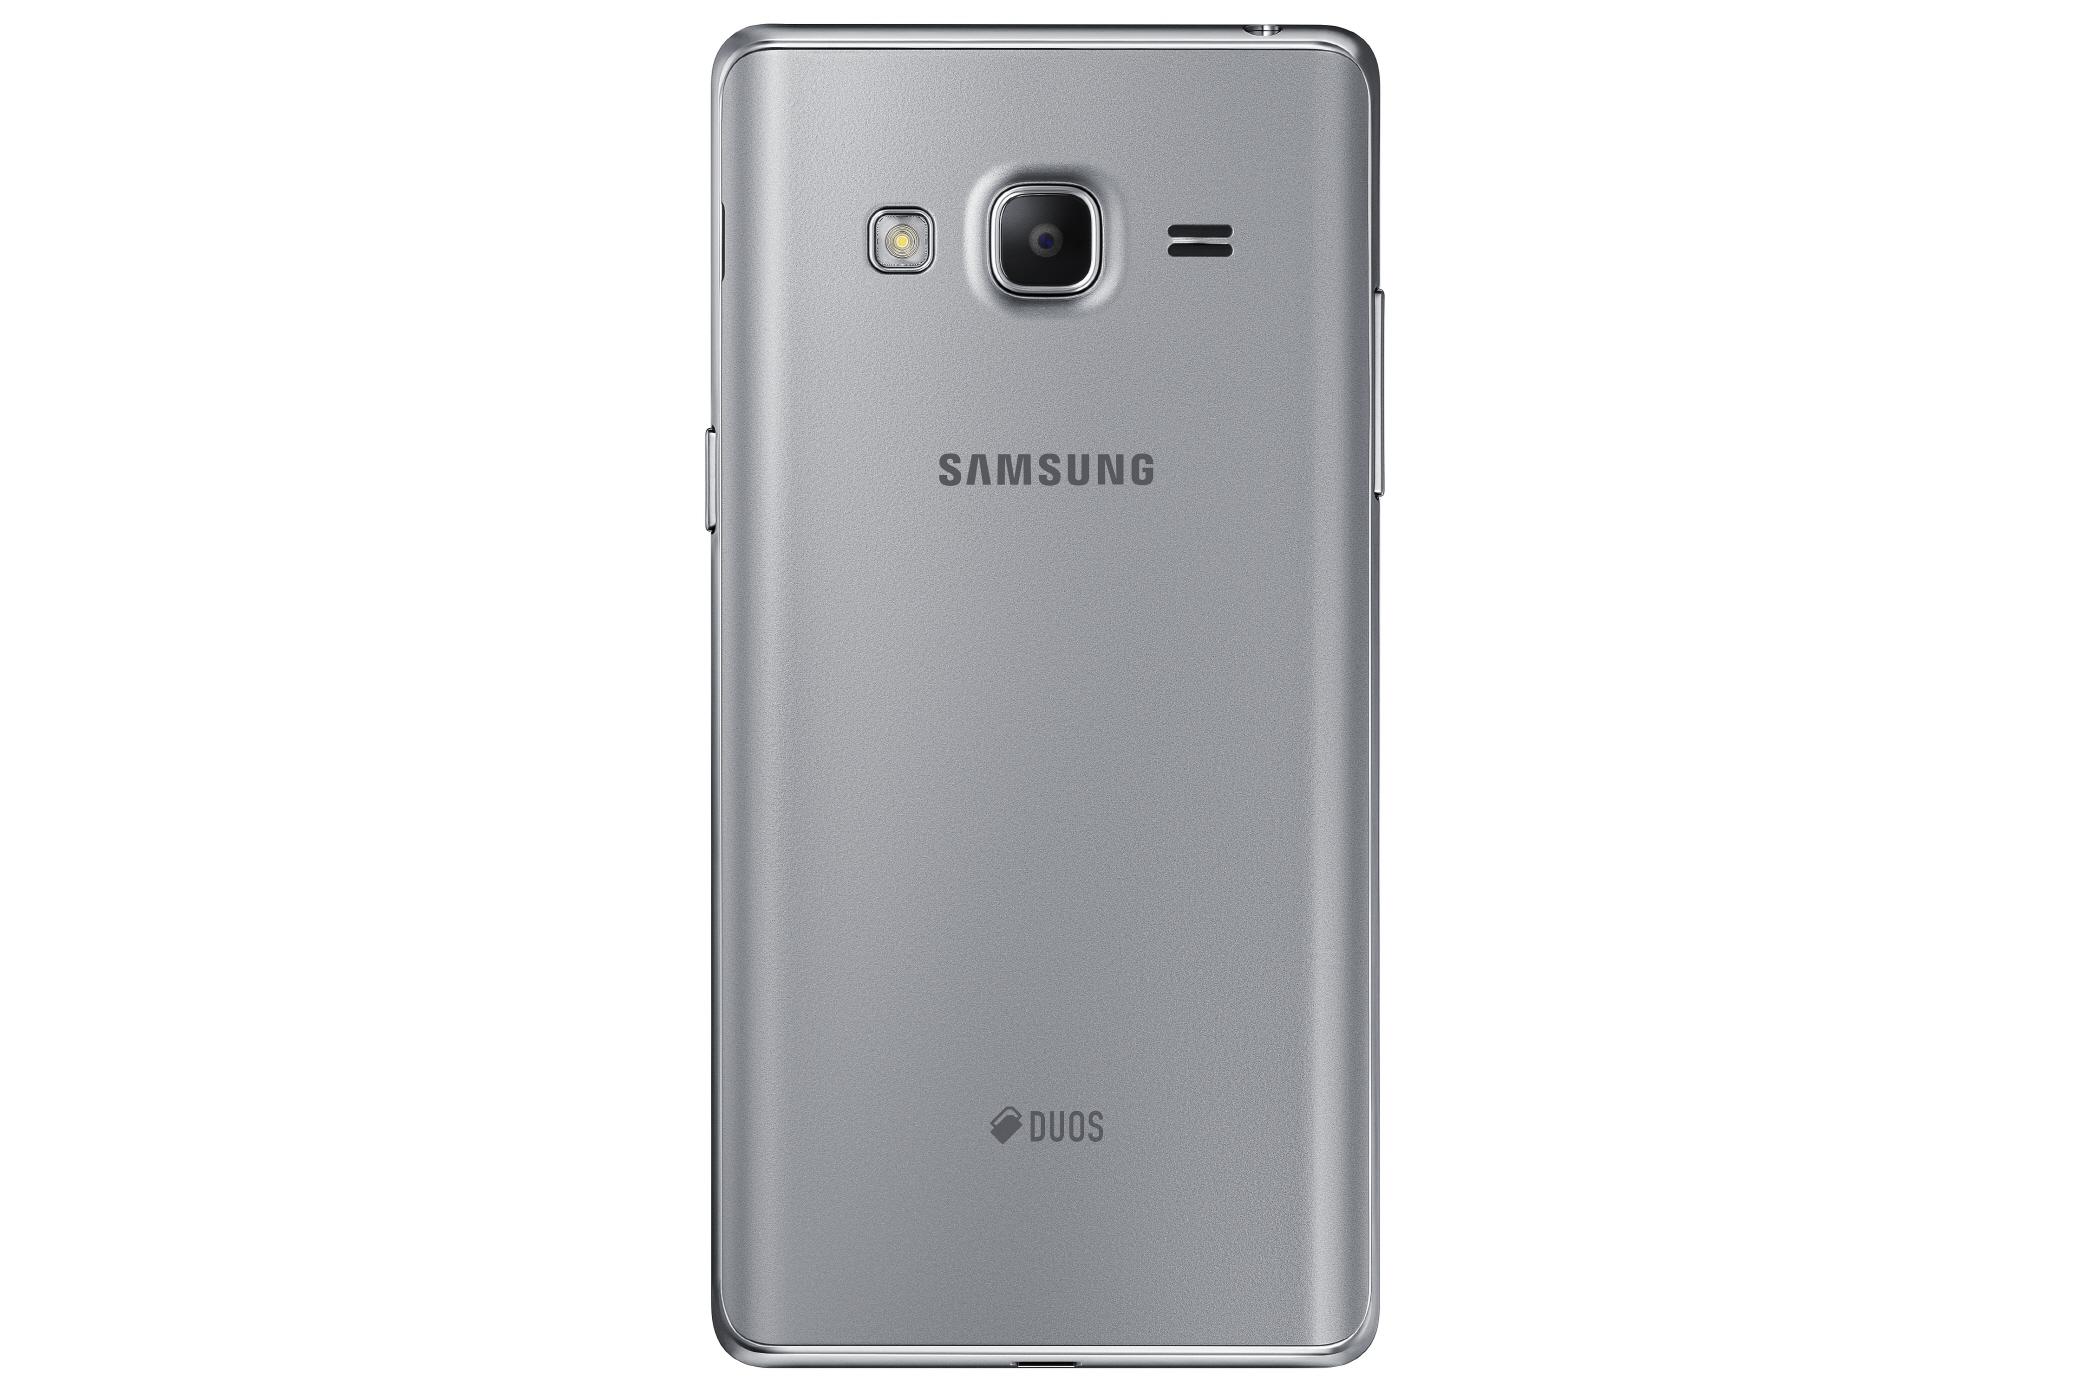 Samsung Z3 Silver Back